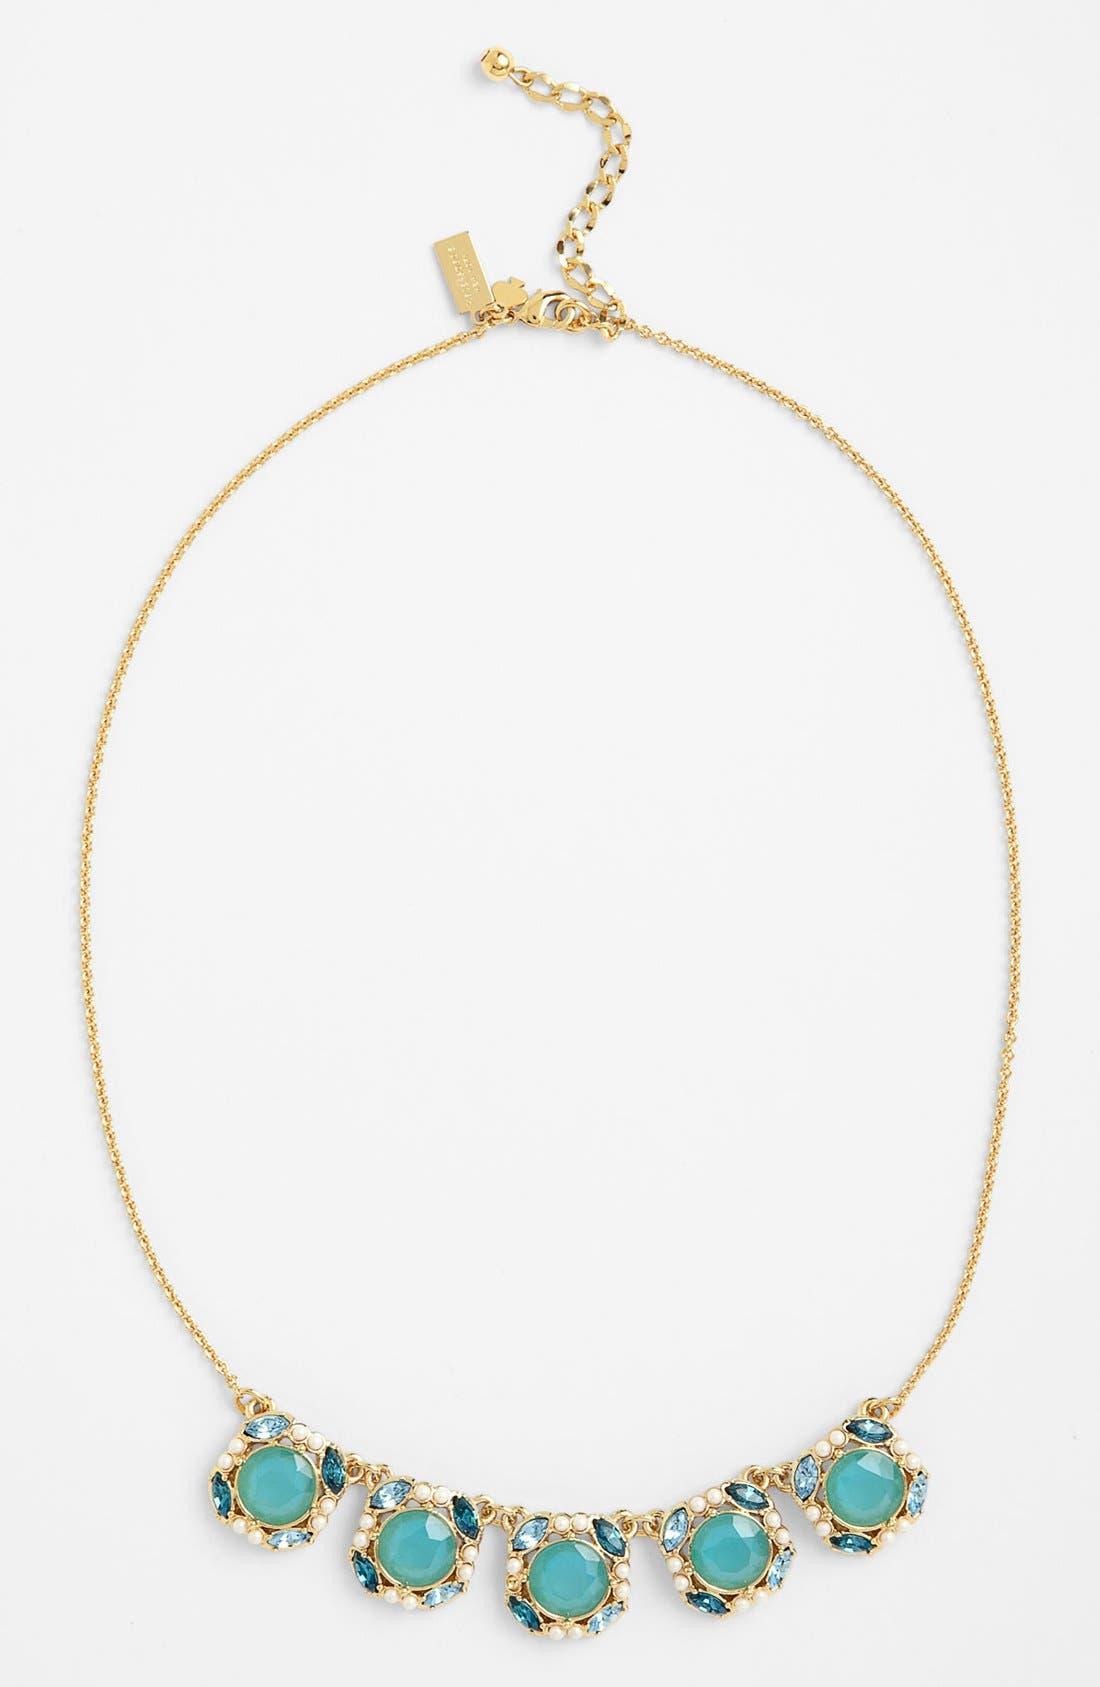 Main Image - kate spade new york 'belle fleur' frontal necklace